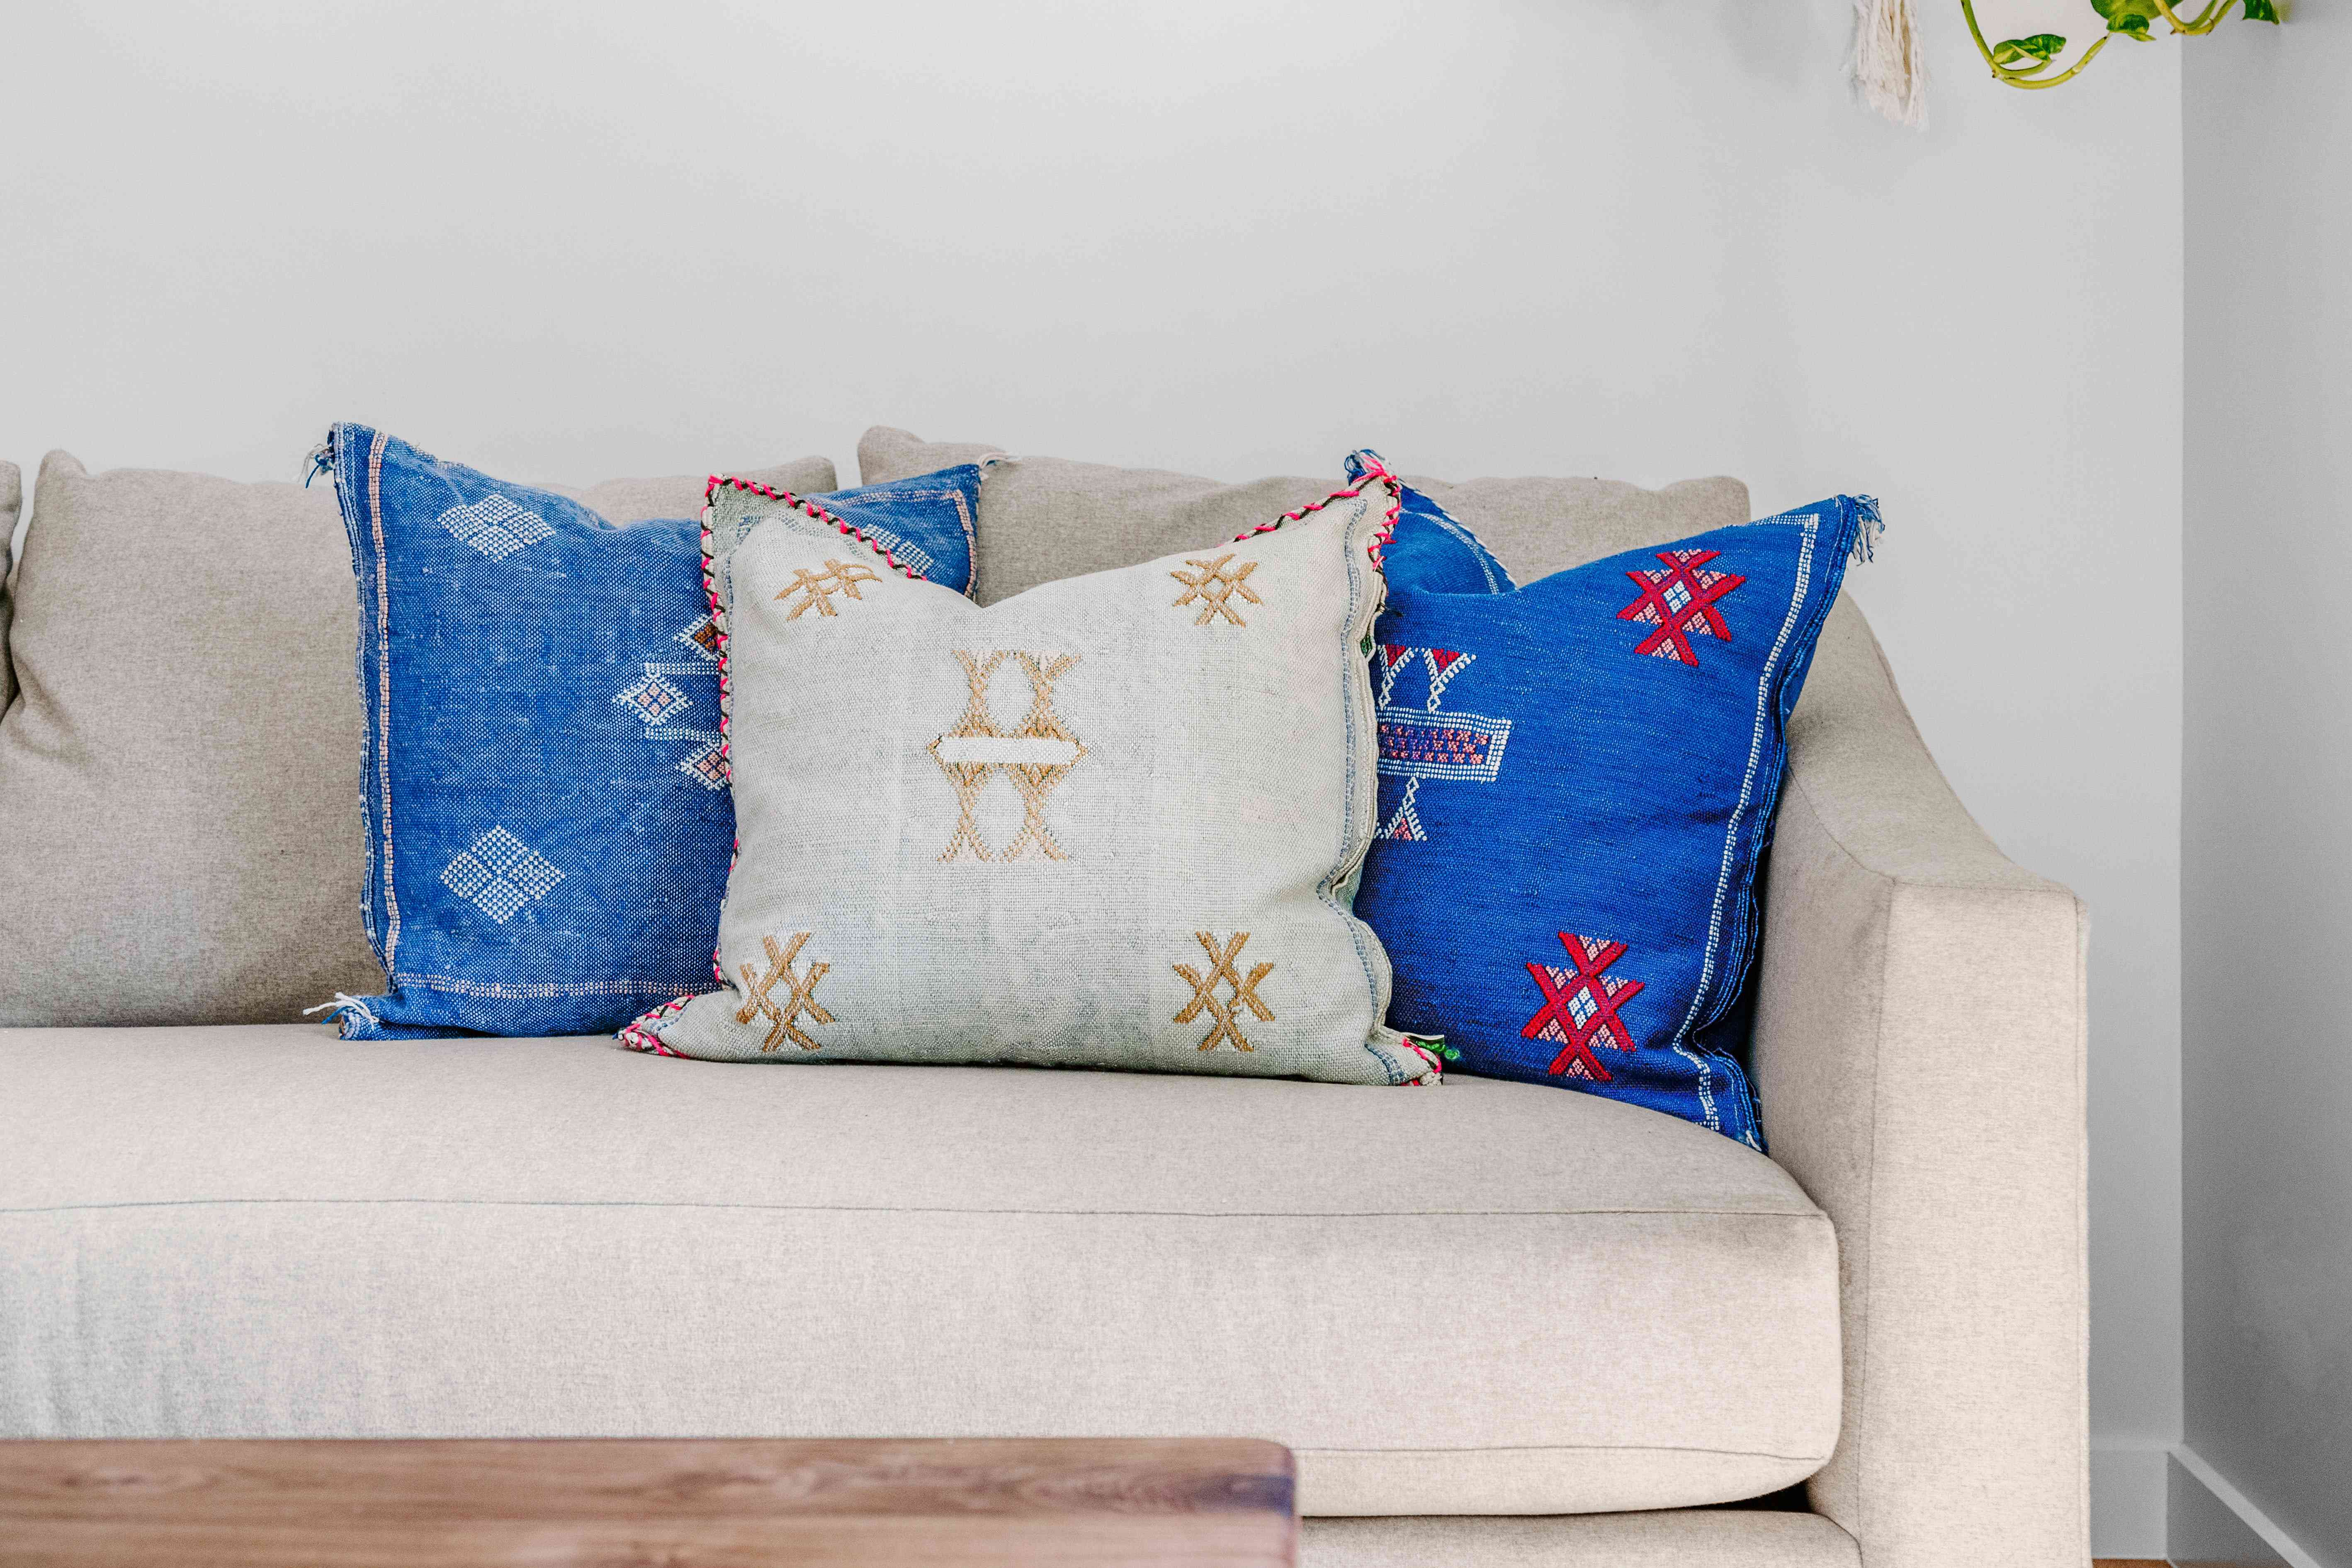 decorative throw pillows on a sofa